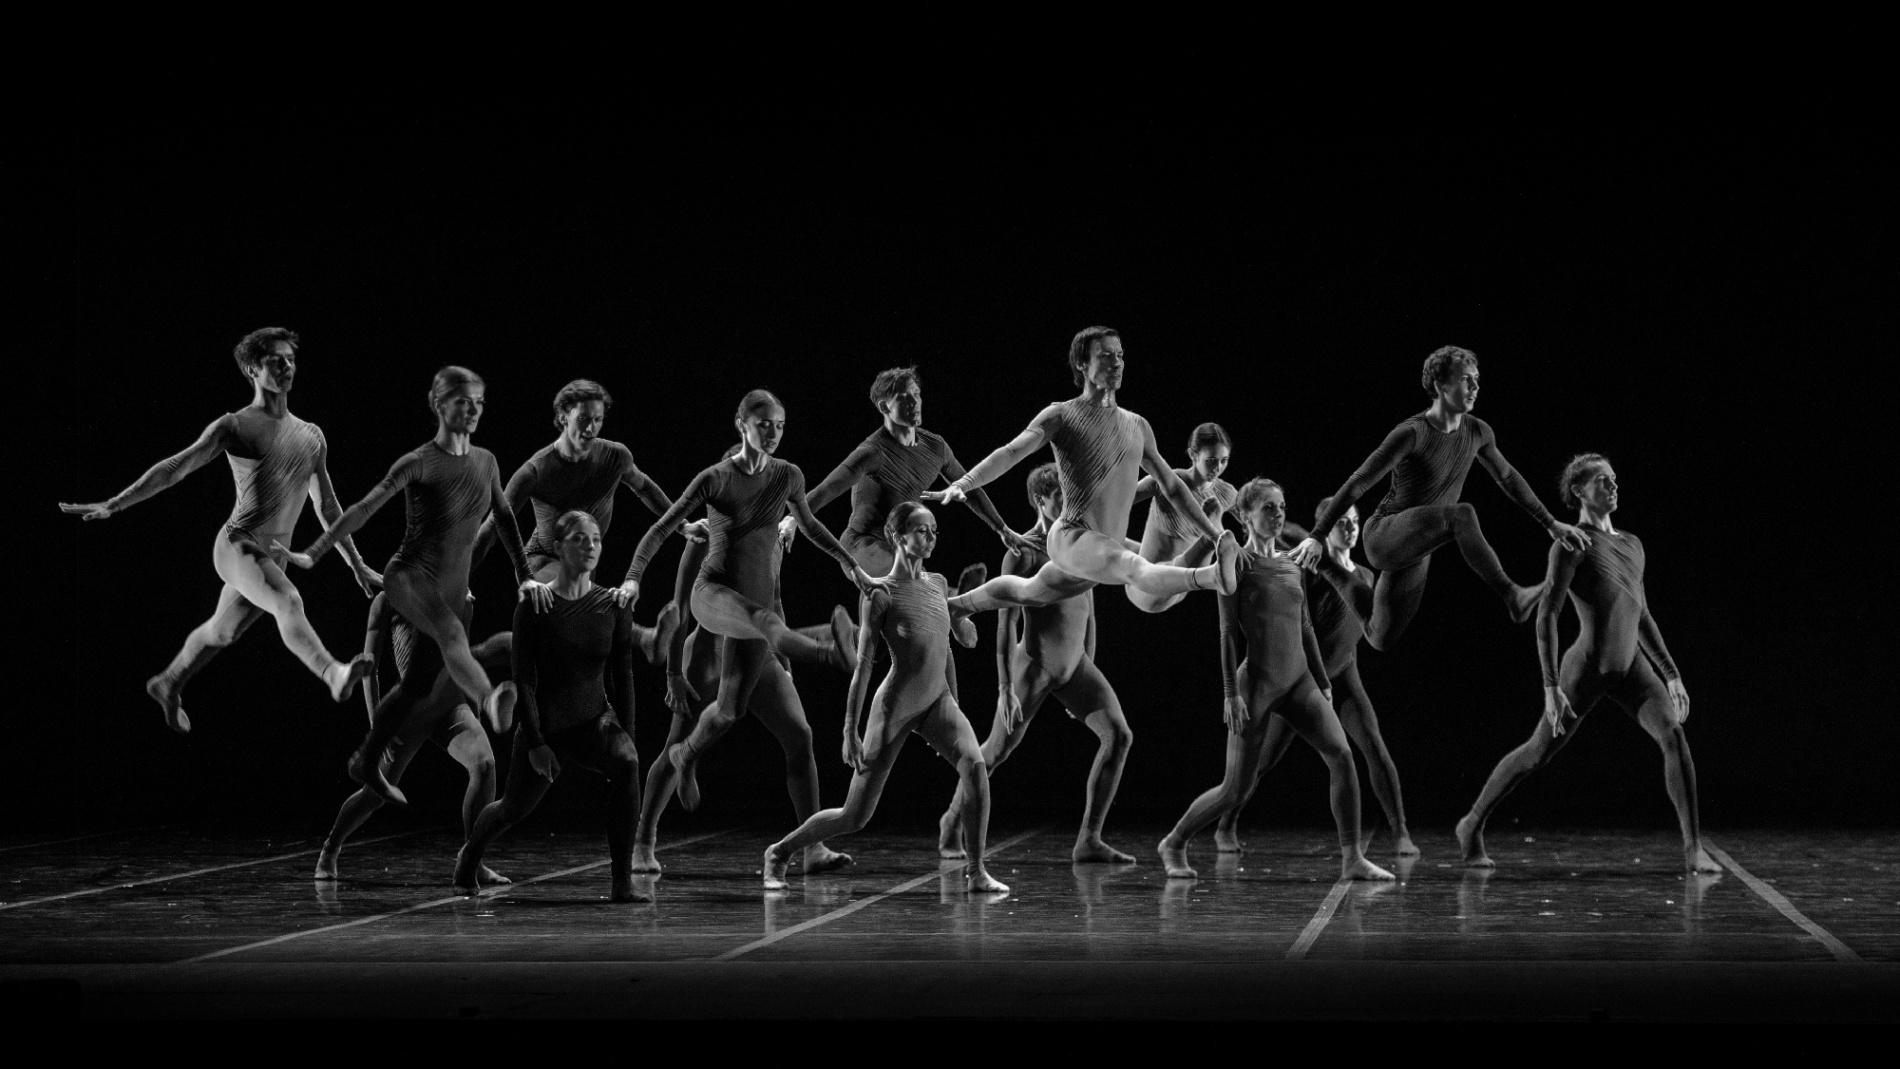 Asunder, Пермский театр оперы и балета